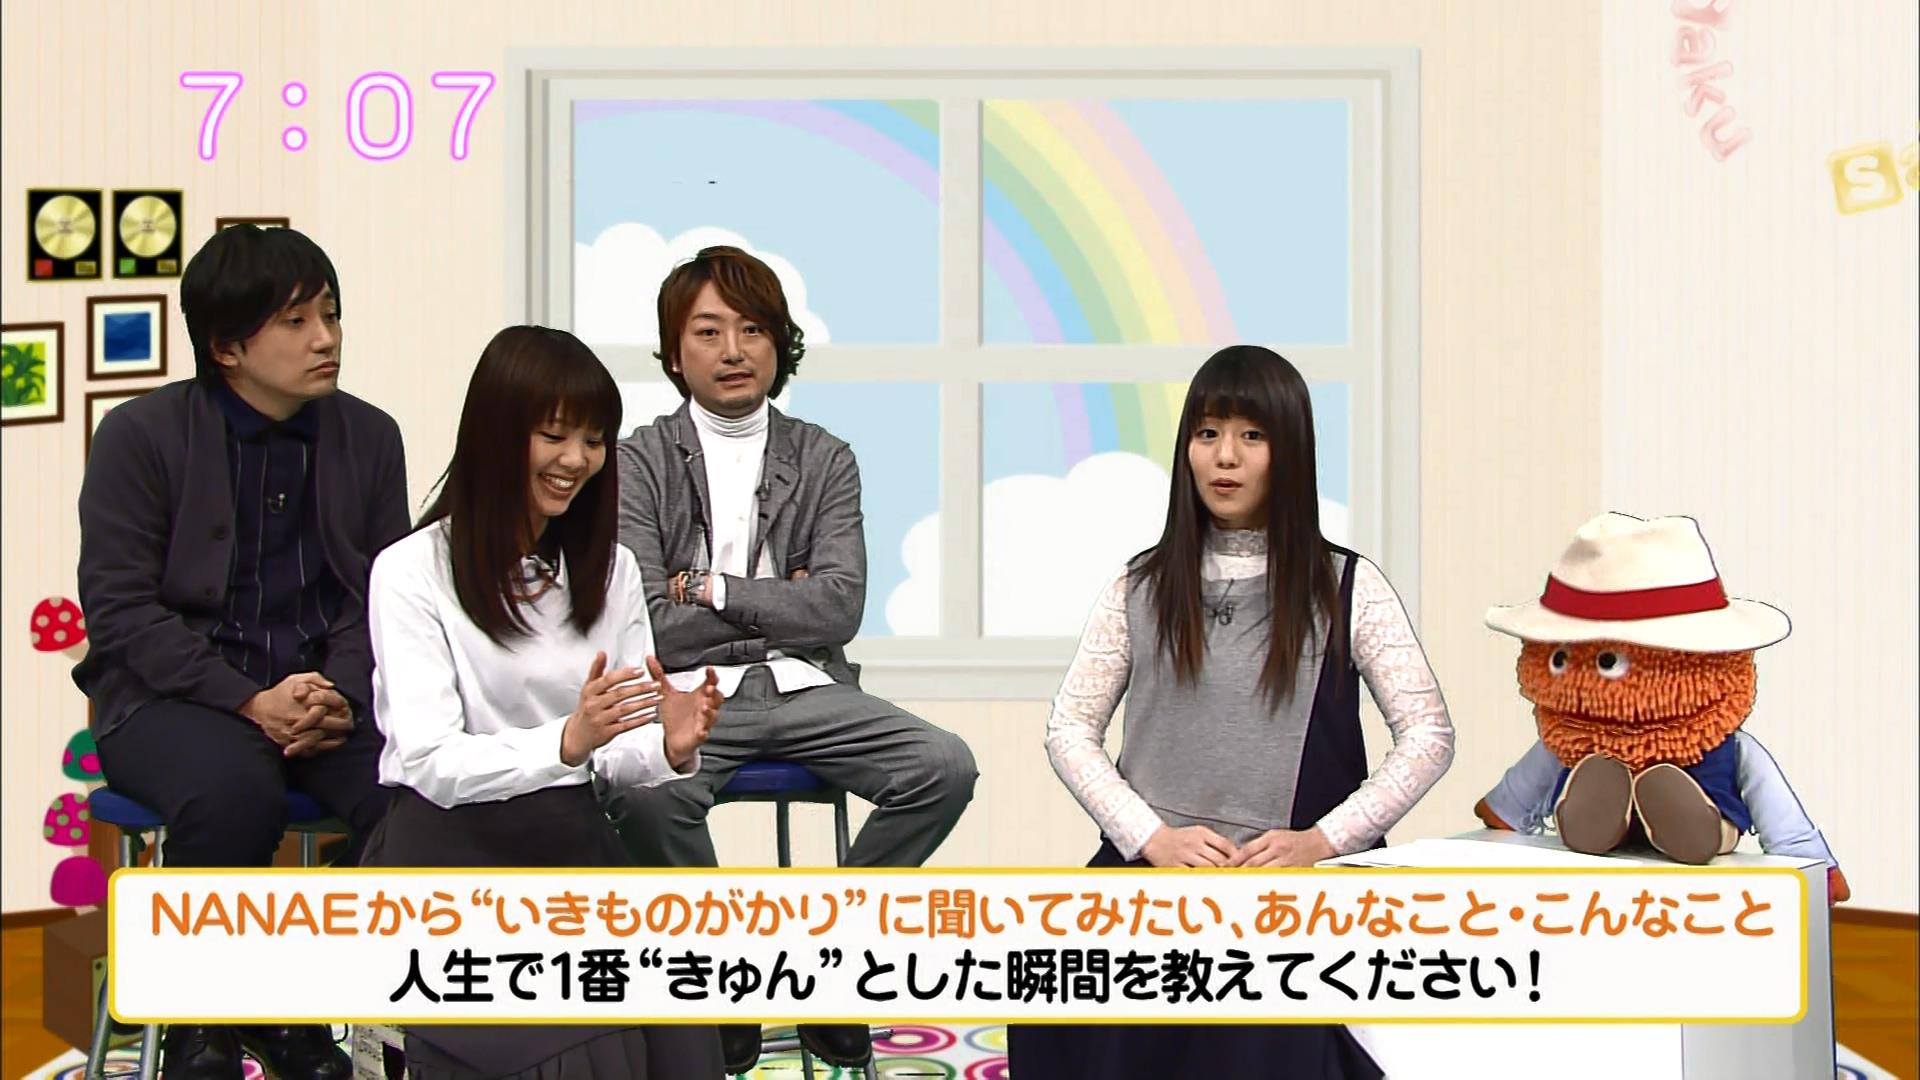 2016.03.17 いきものがかり(saku saku).ts_20160317_080044.281